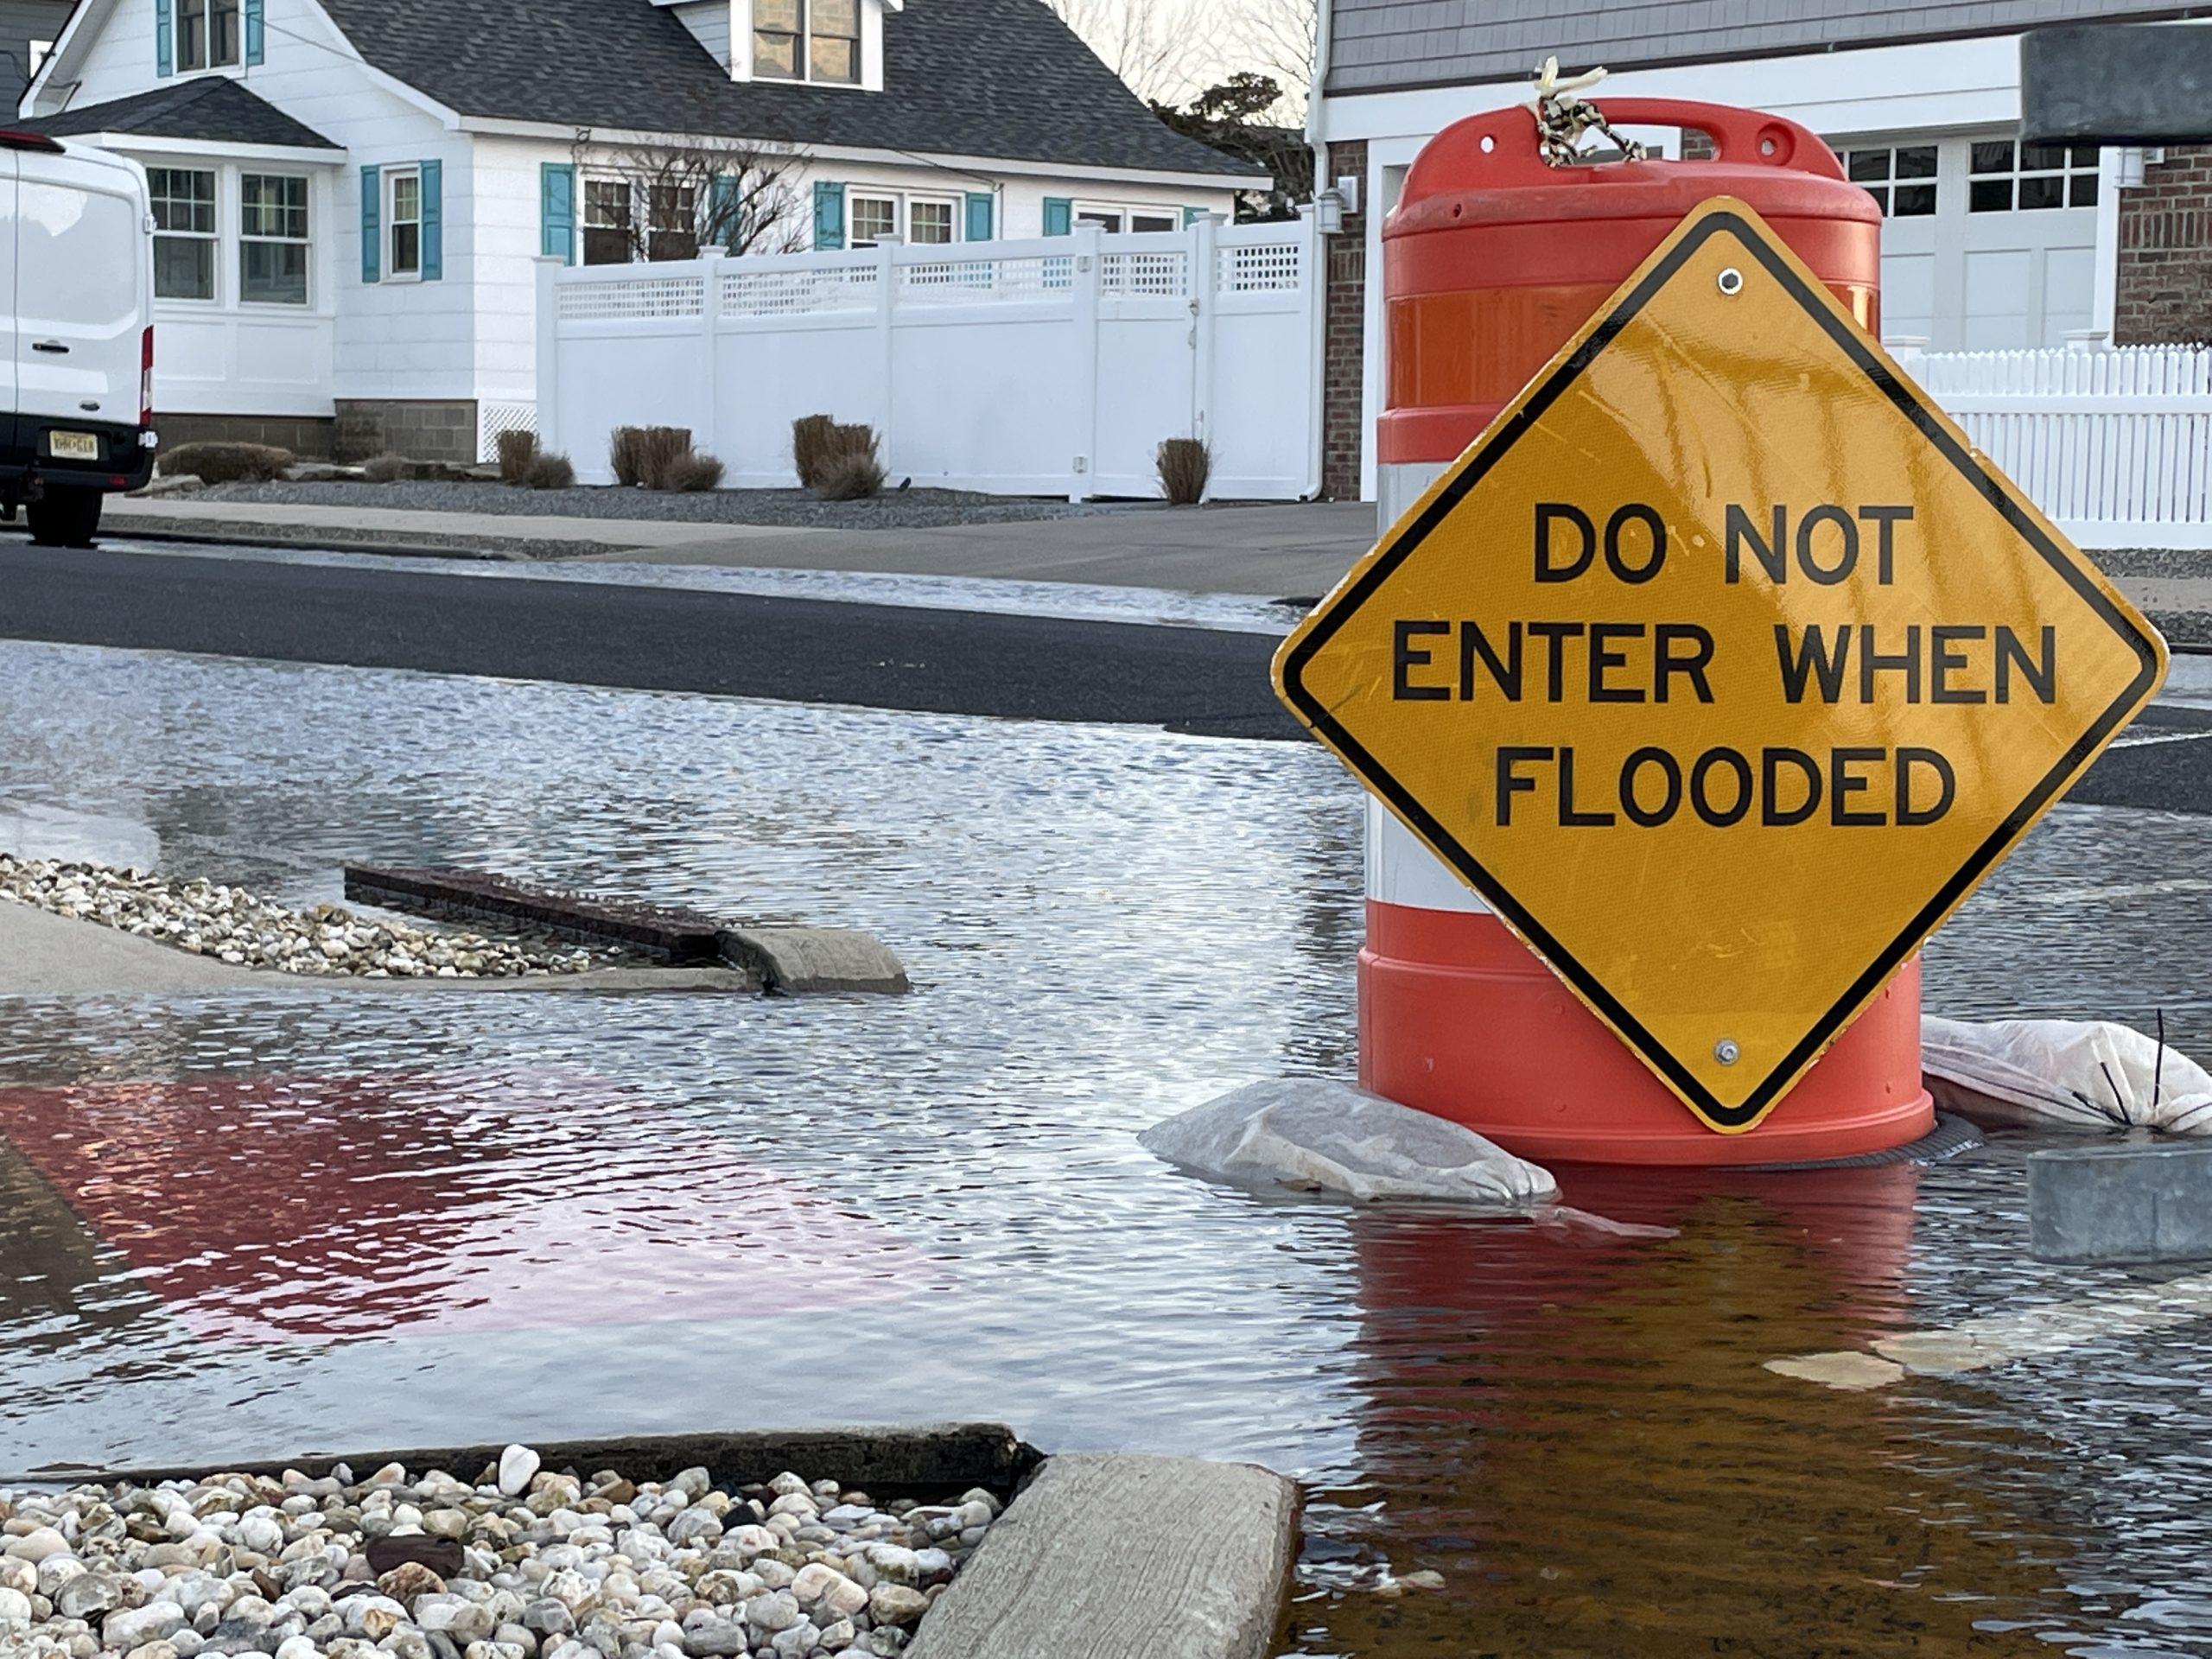 Flooding in the Normandy Beach neighborhood, Jan. 2021. (Photo: Daniel Nee)